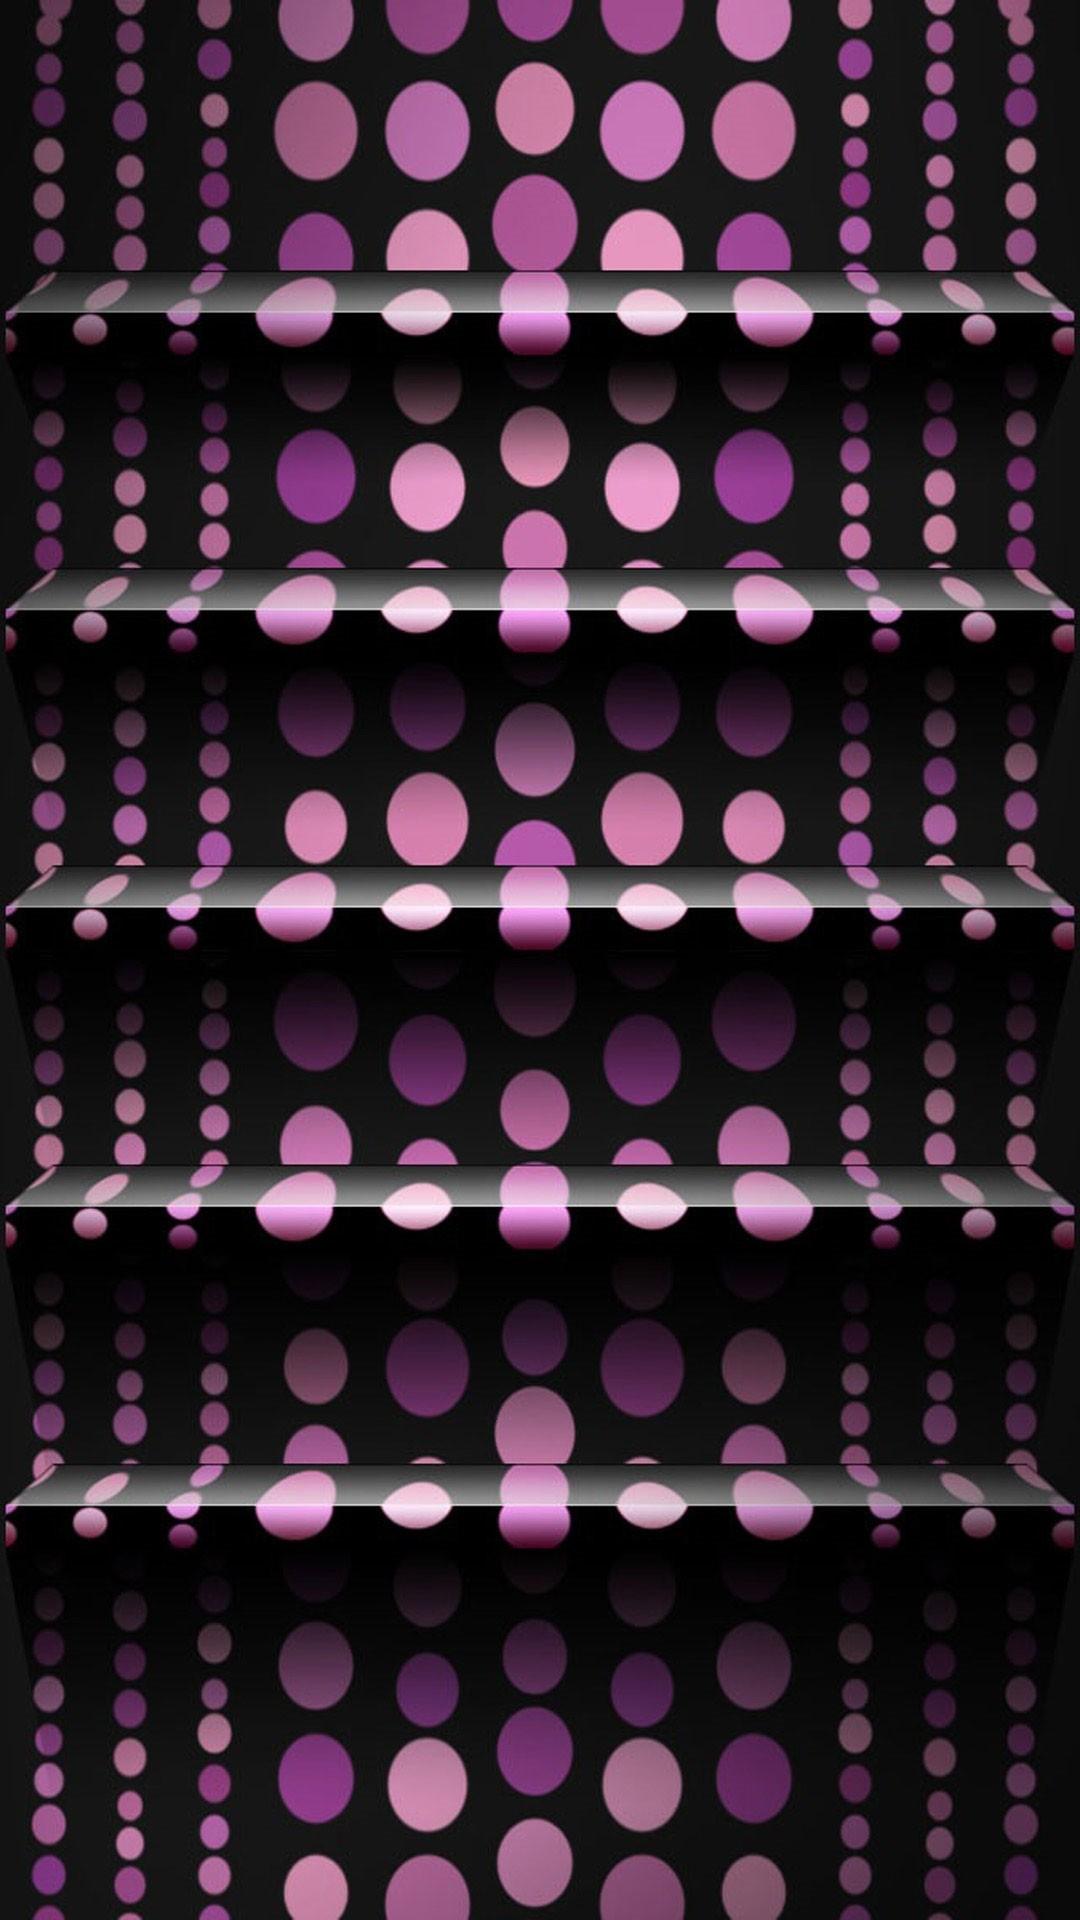 Home Screen iPhone 6 wallpaper